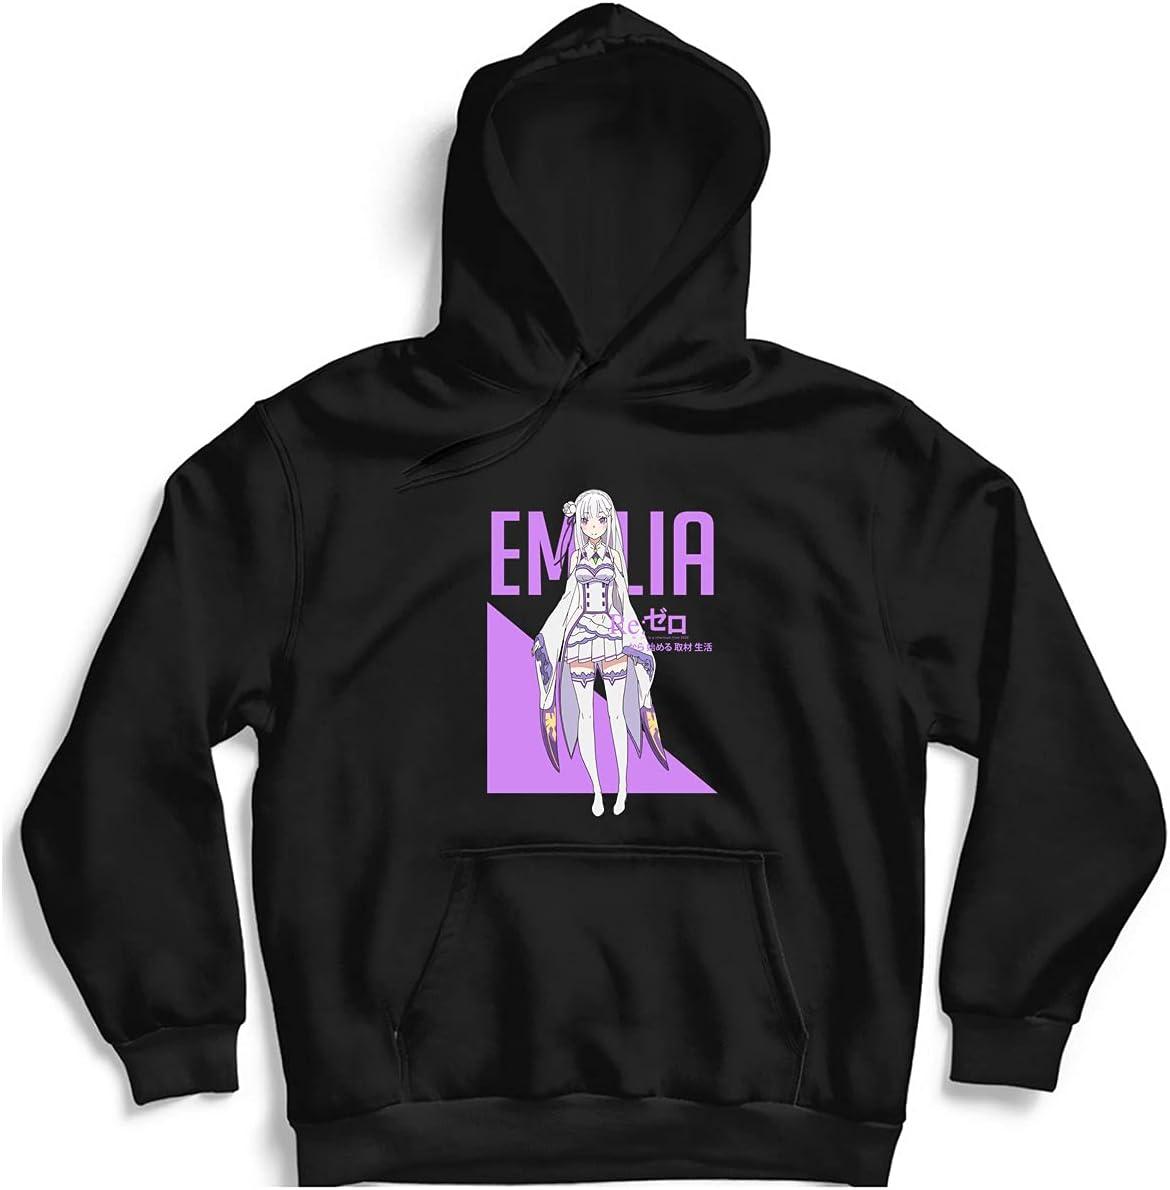 Animer and price revision Emilia Rezero Typography 2 Classic Women Hoodie Men Max 90% OFF U For